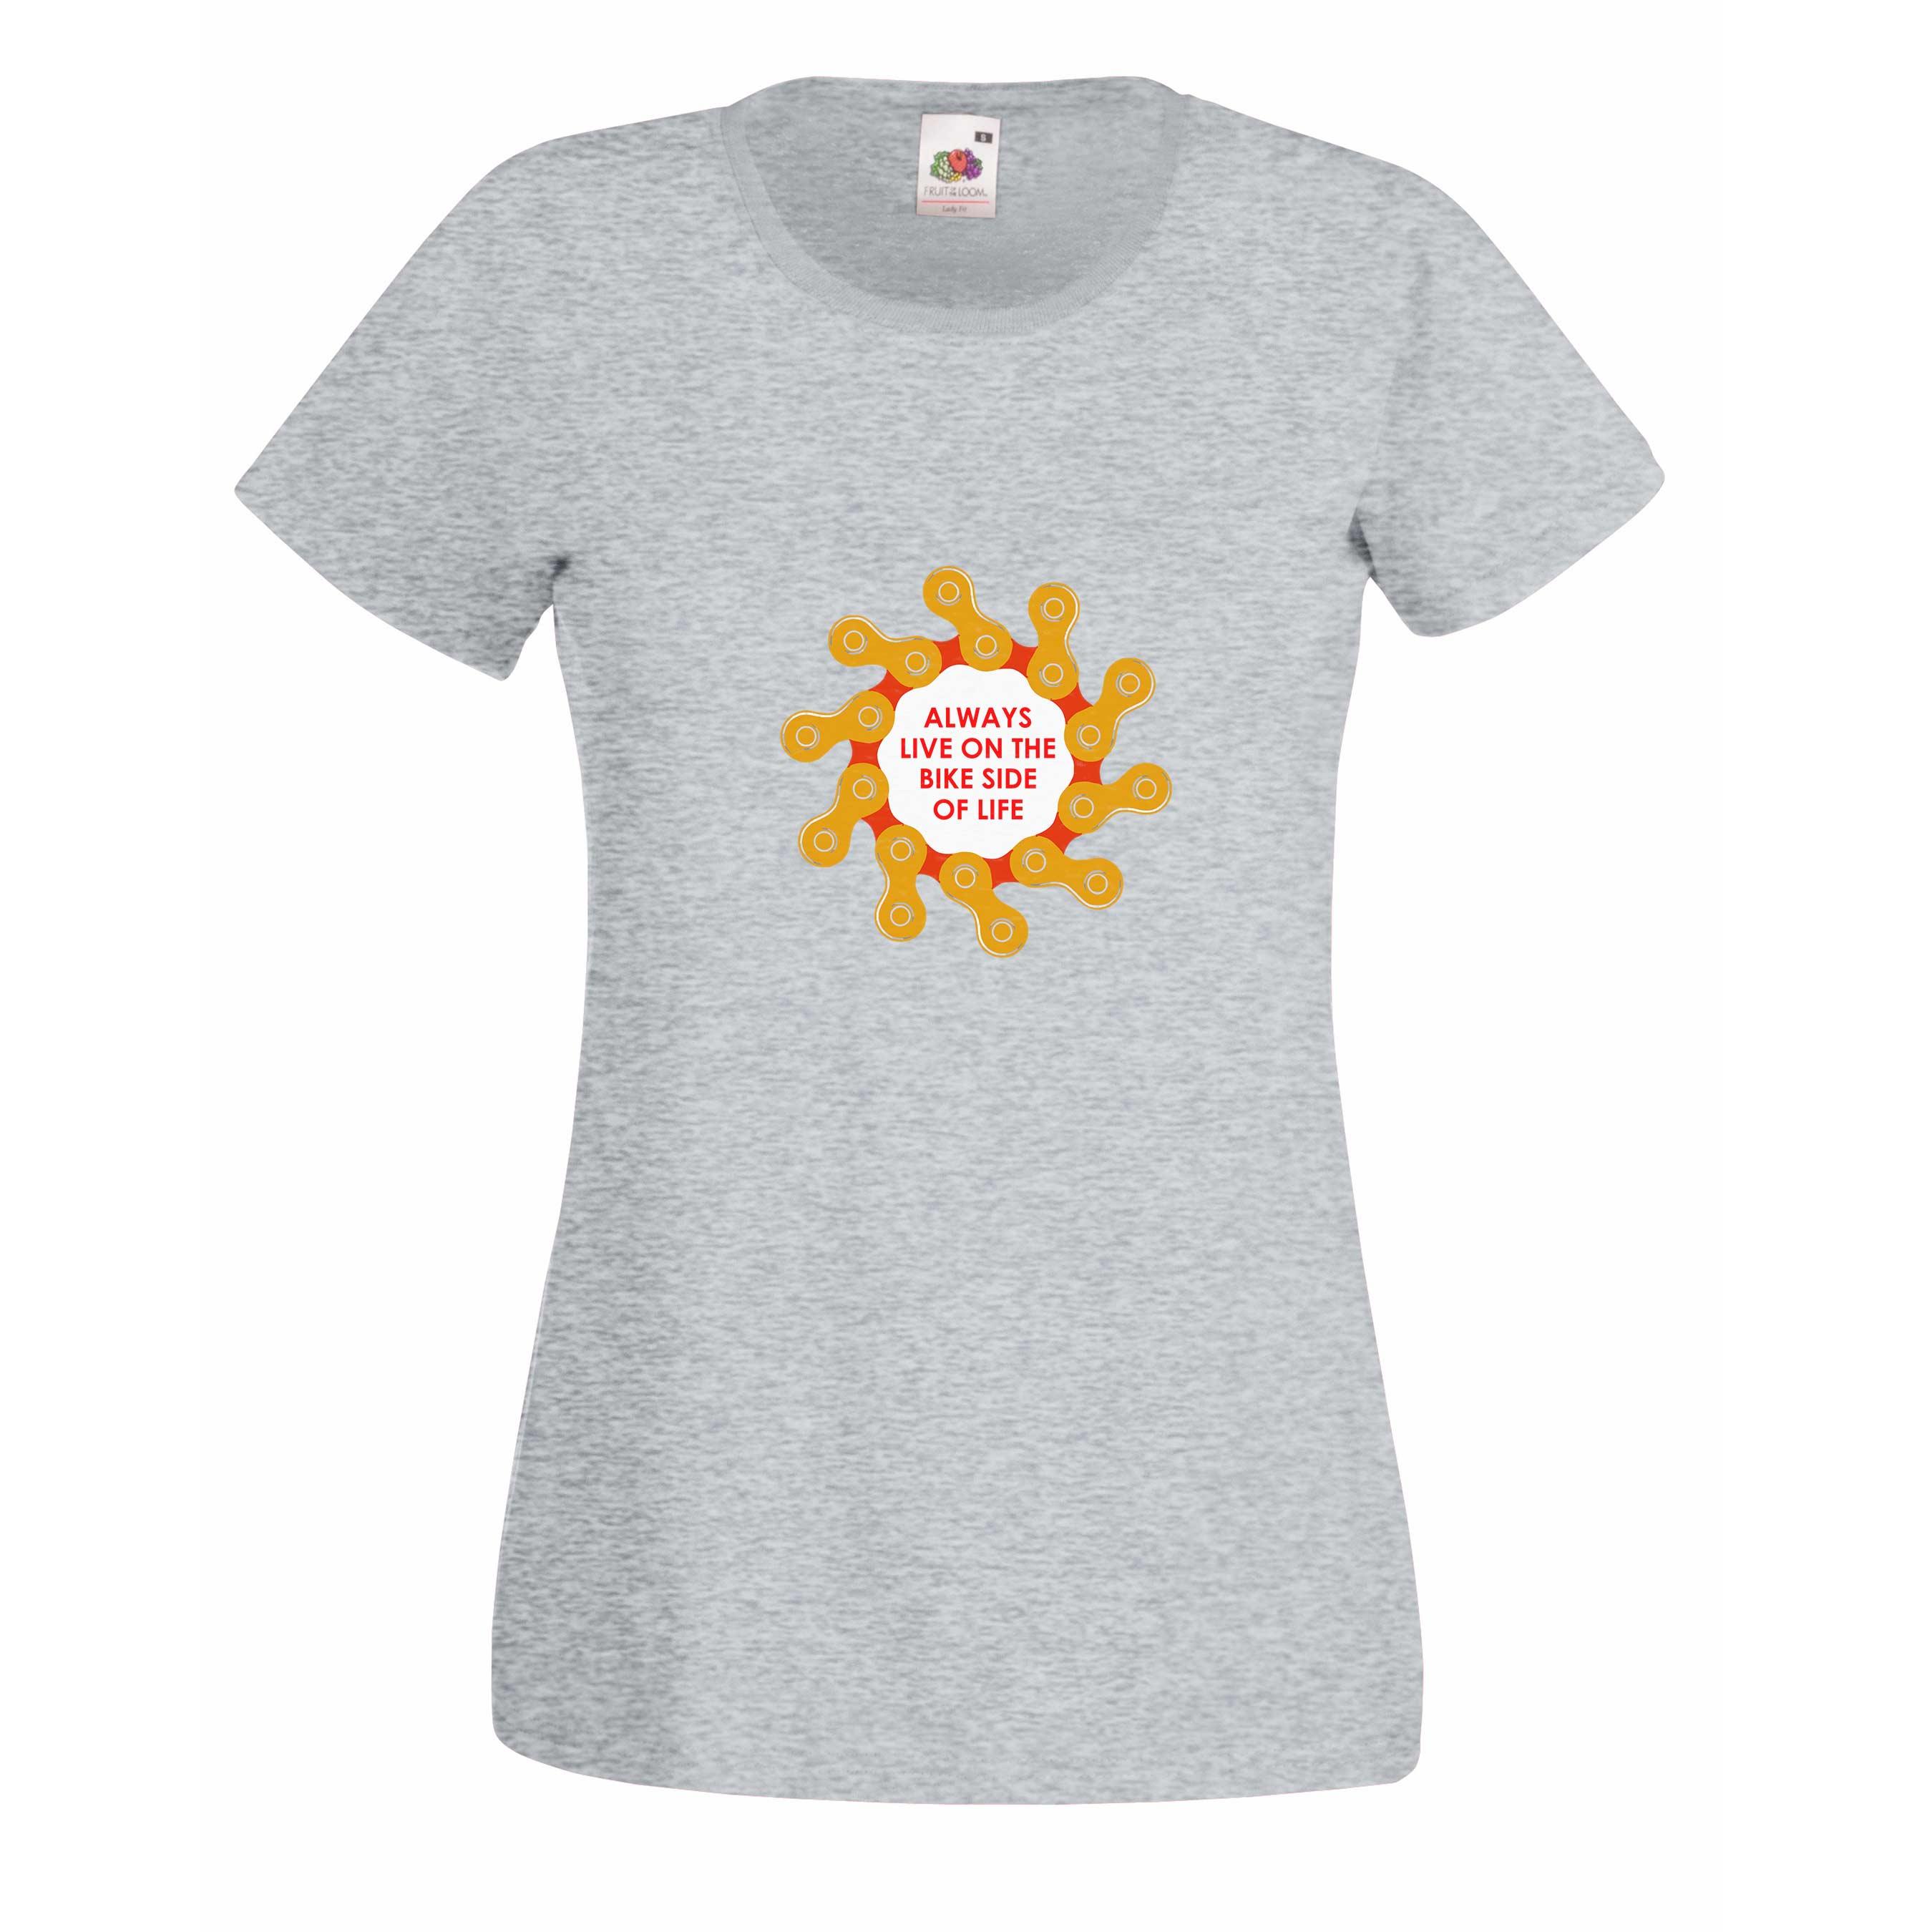 Bike side of life design for t-shirt, hoodie & sweatshirt